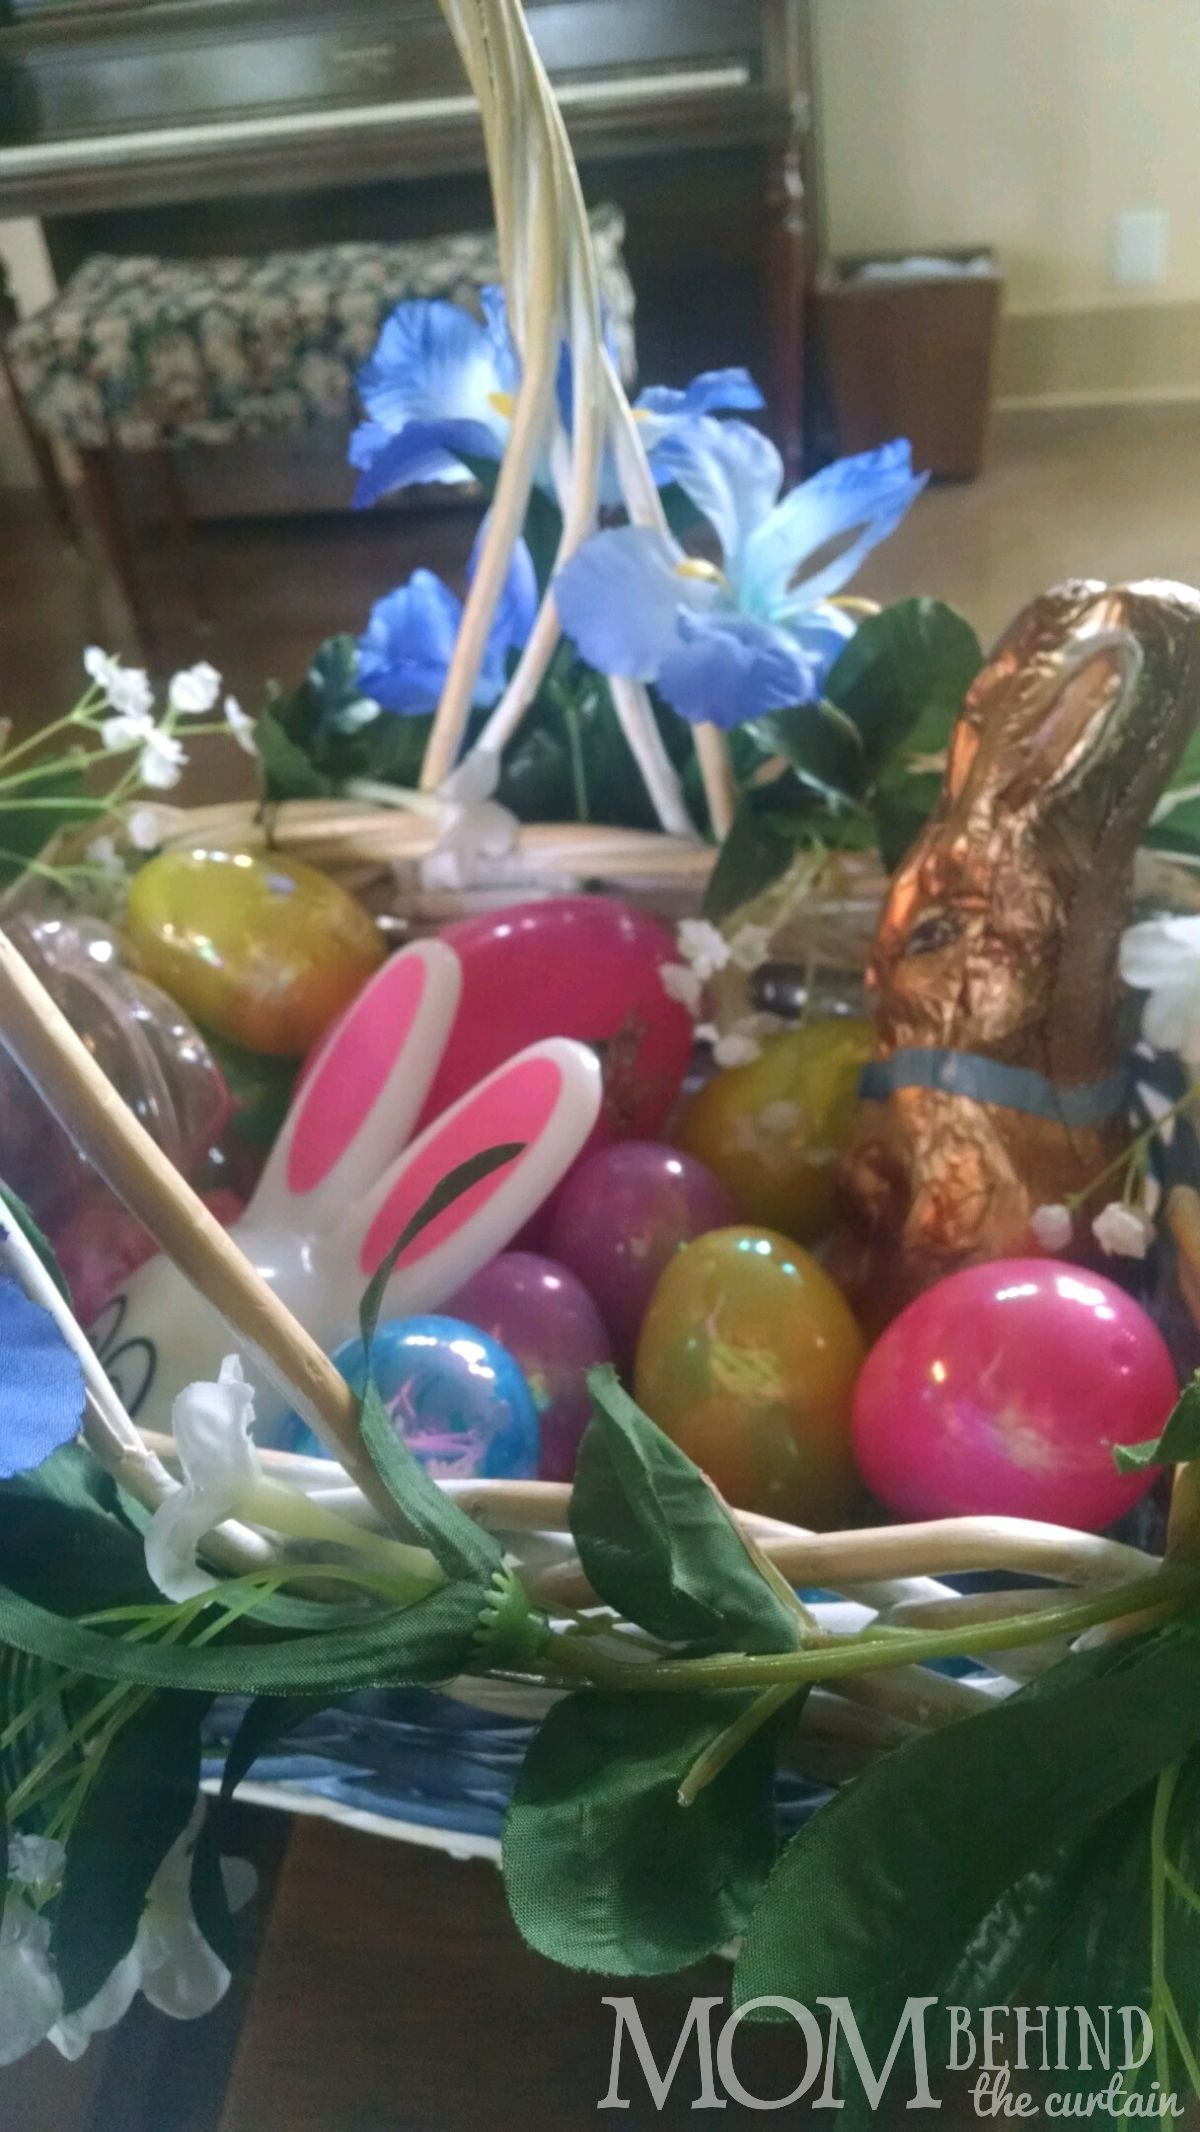 Text & Instagram scavenger hunt photo, Easter game ideas for teens and tweens - Easter basket